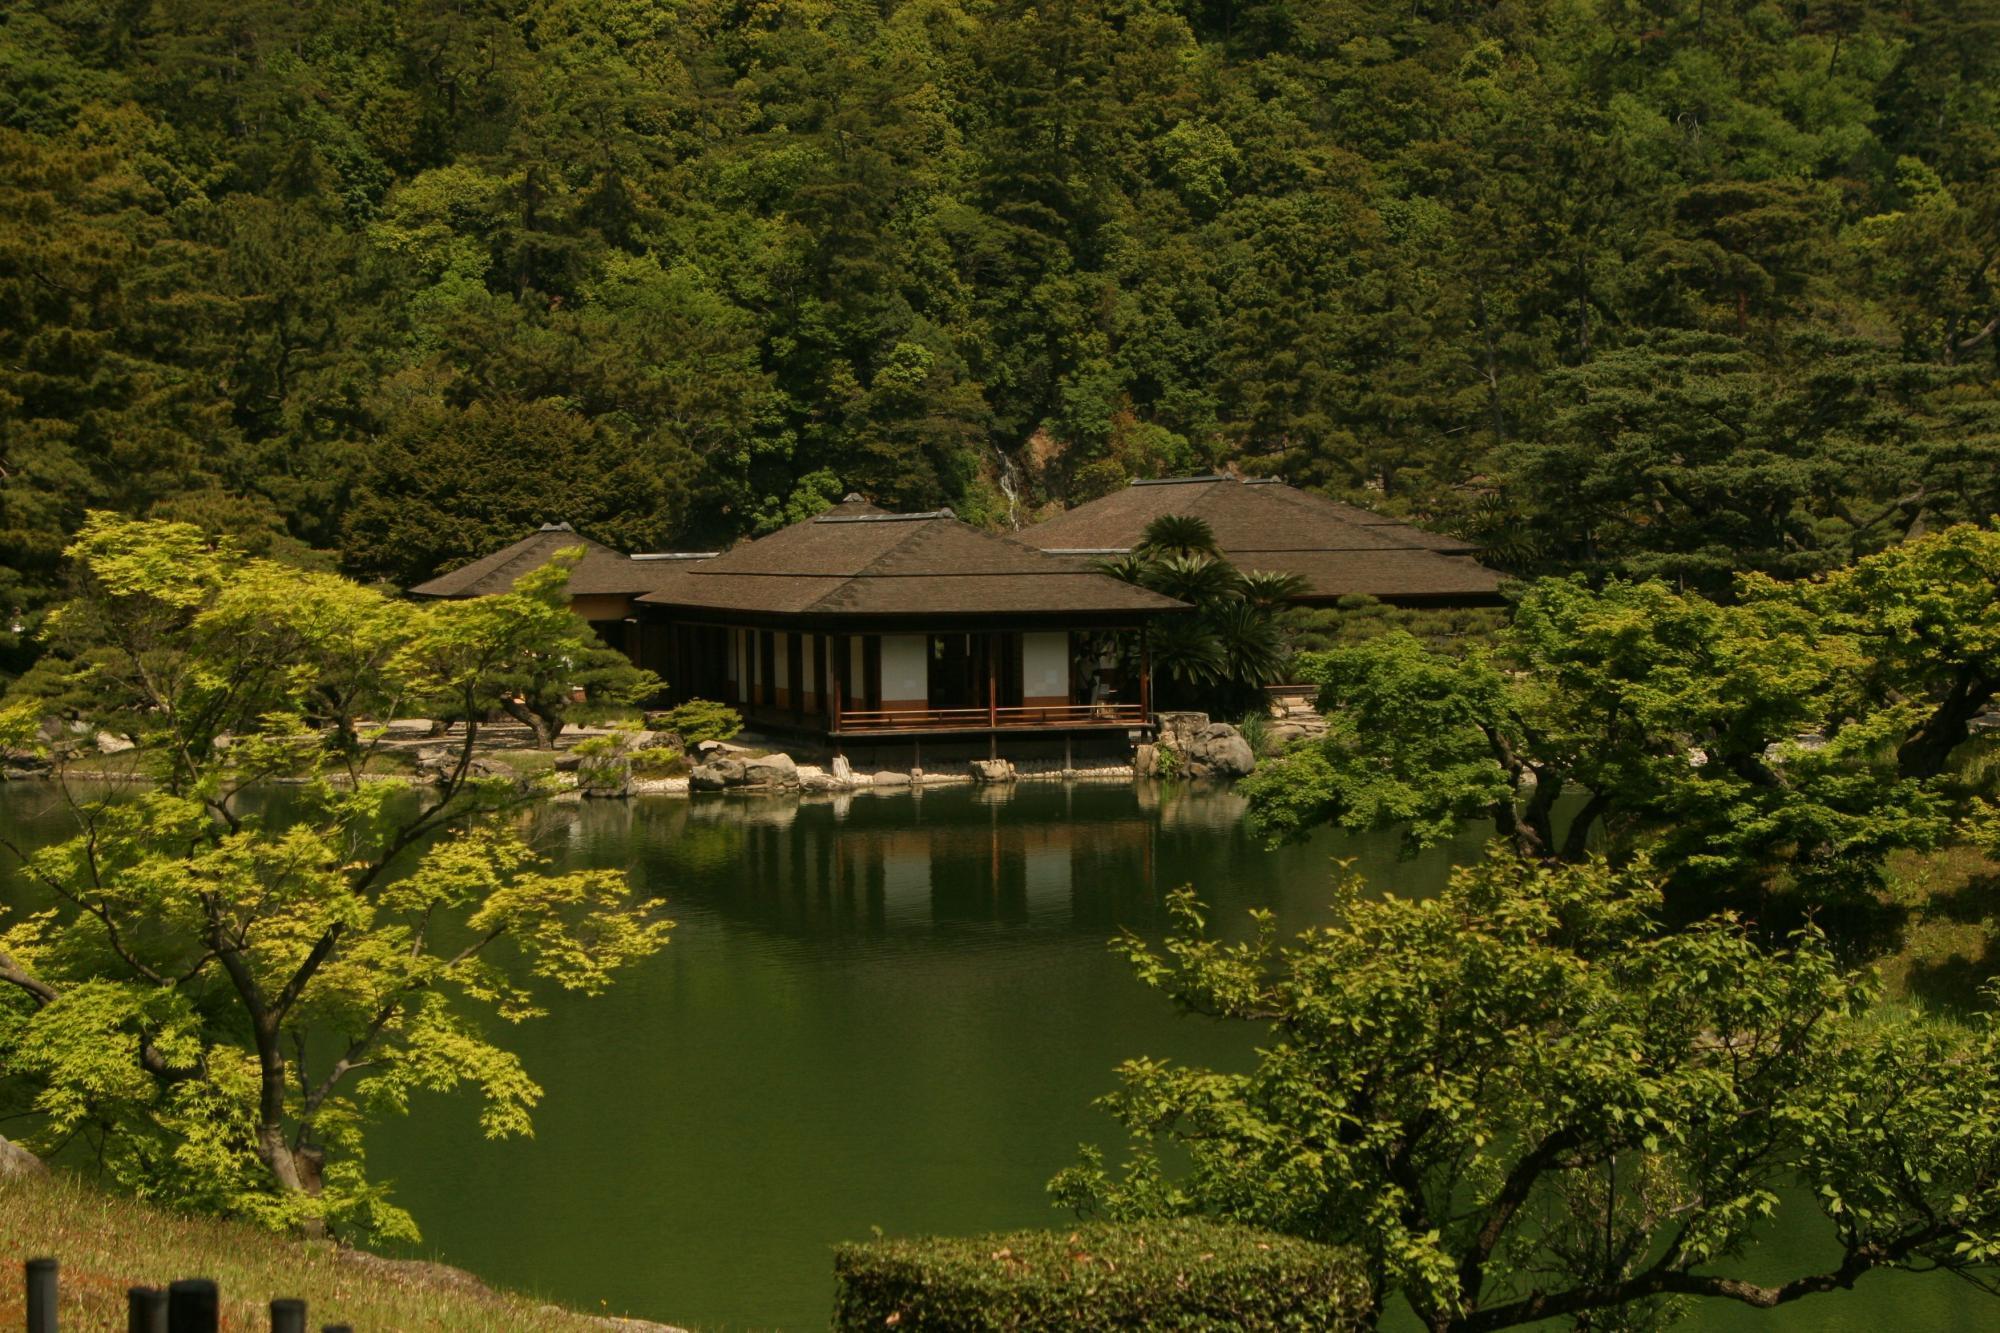 Japanese Garden Tour: Aesthetics at its Finest | Zicasso